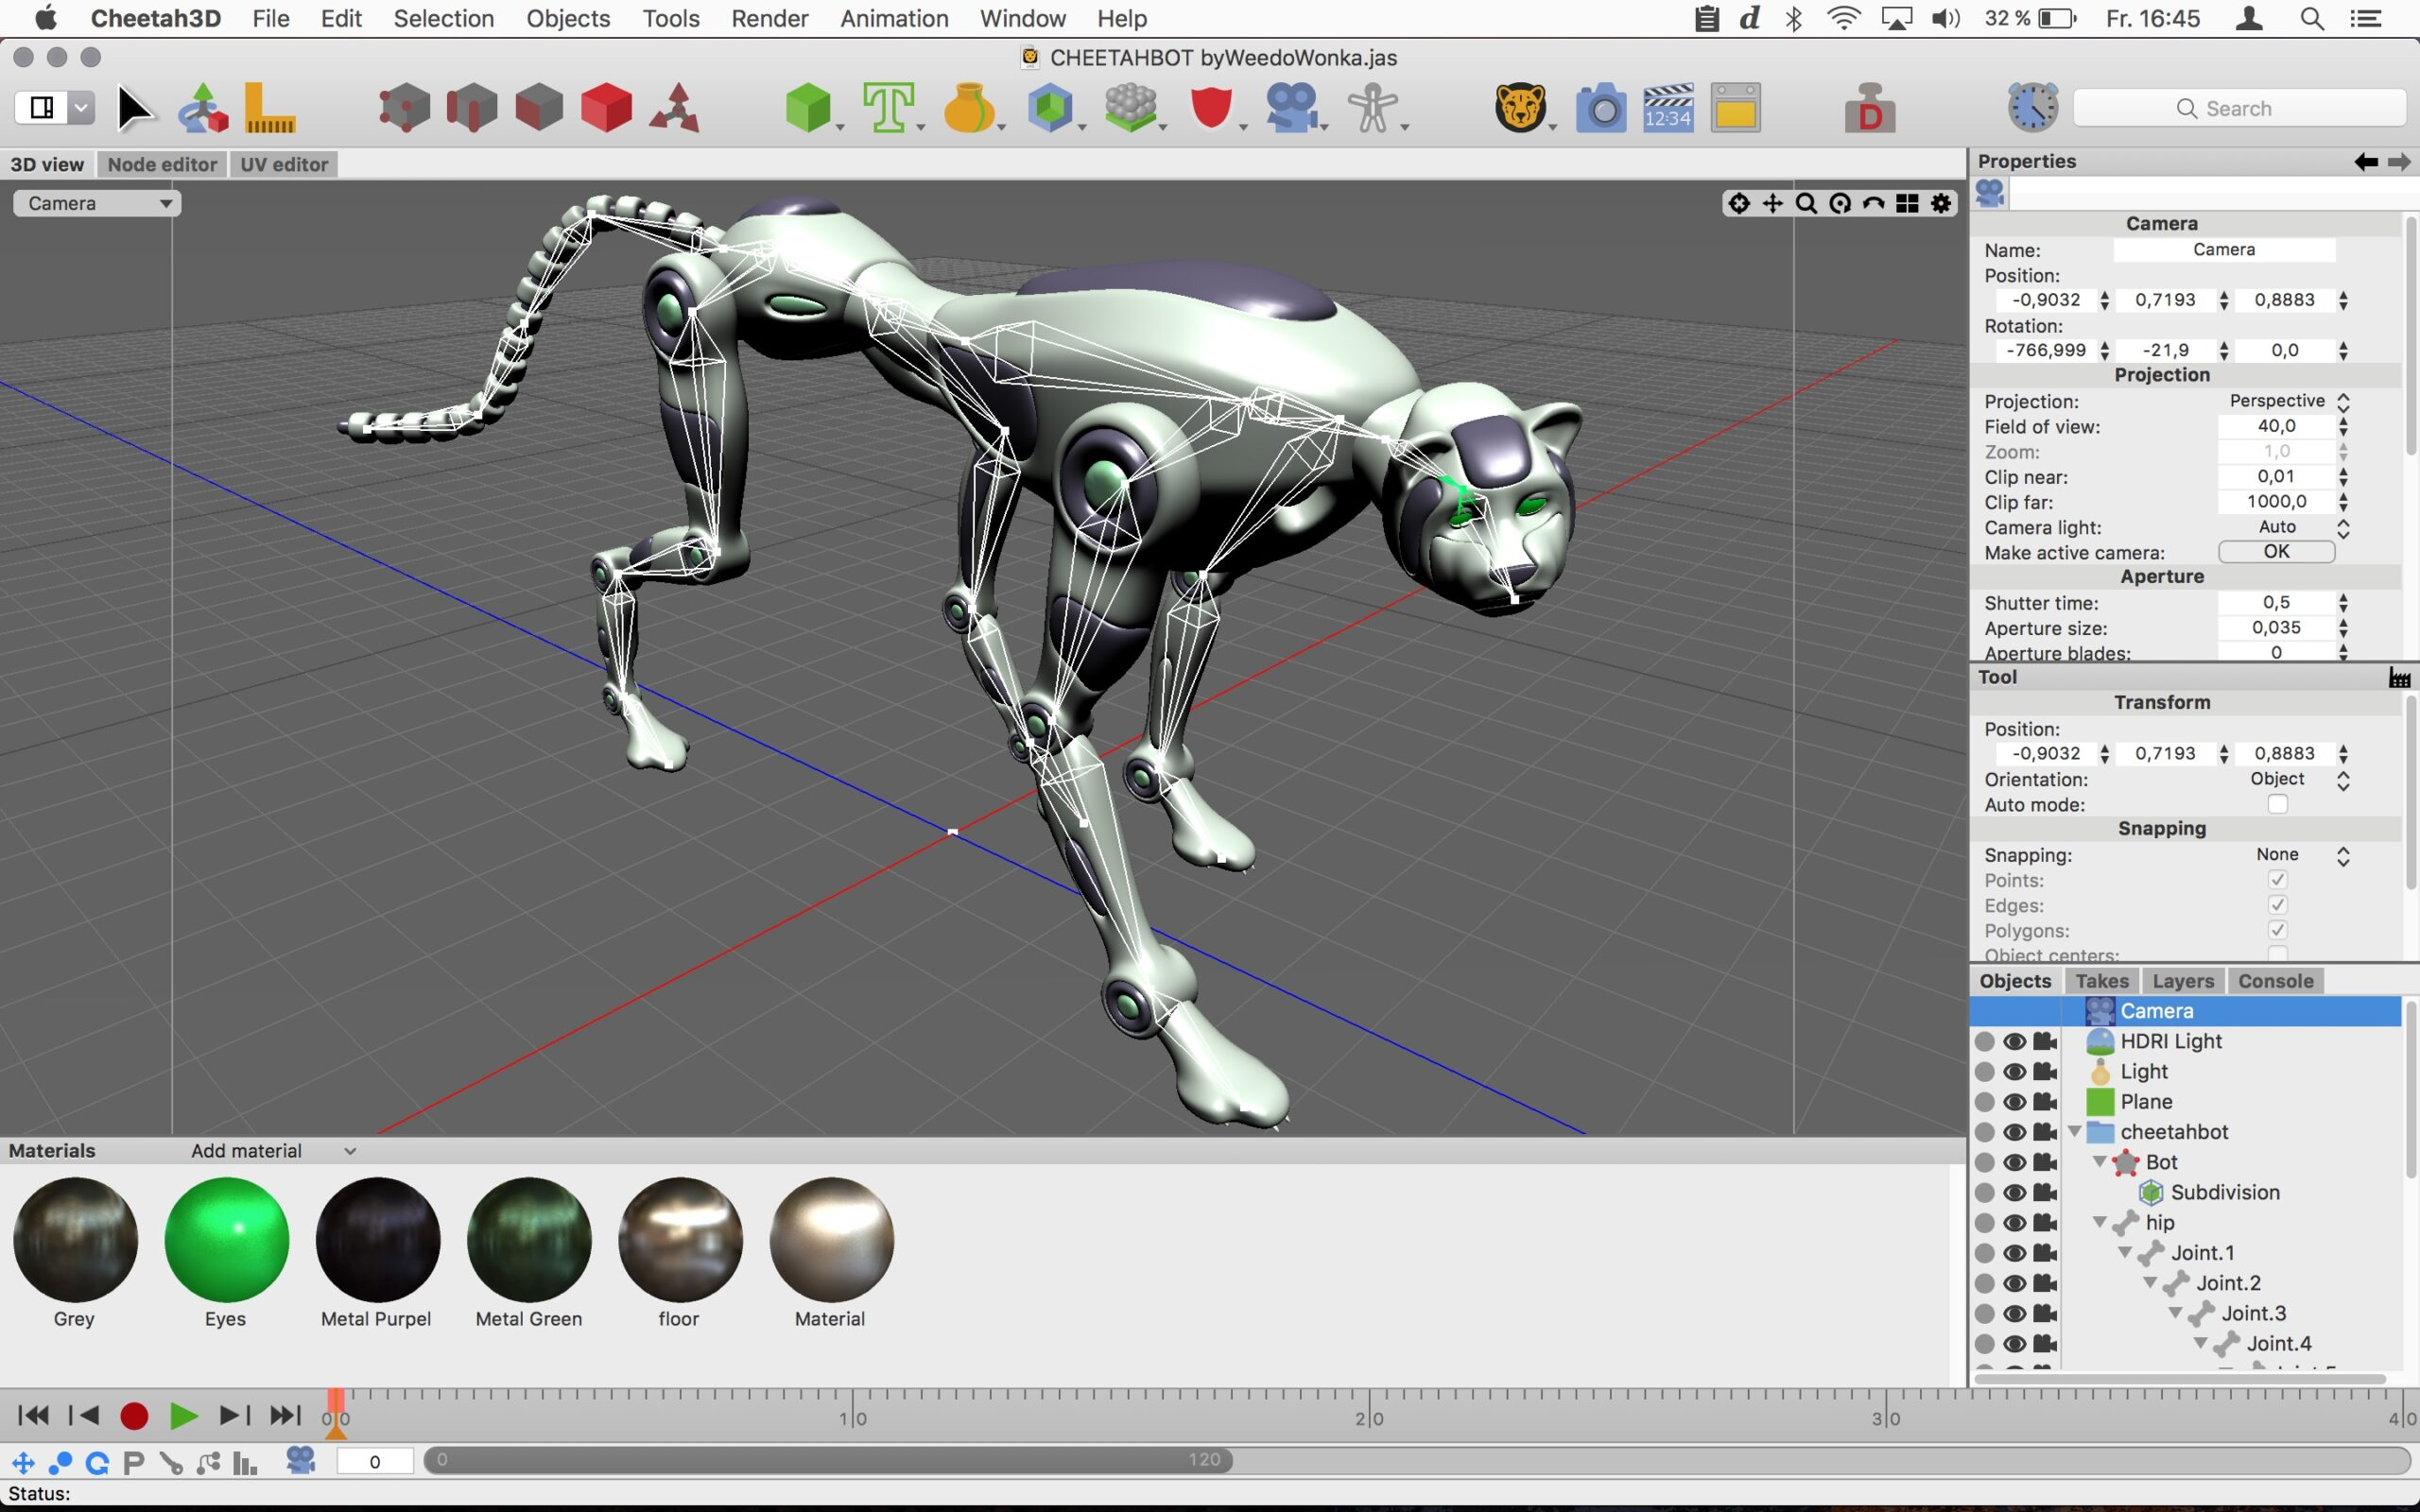 MW3D-Solutions-Cheetah3D-for-Mac-Torrent-Download